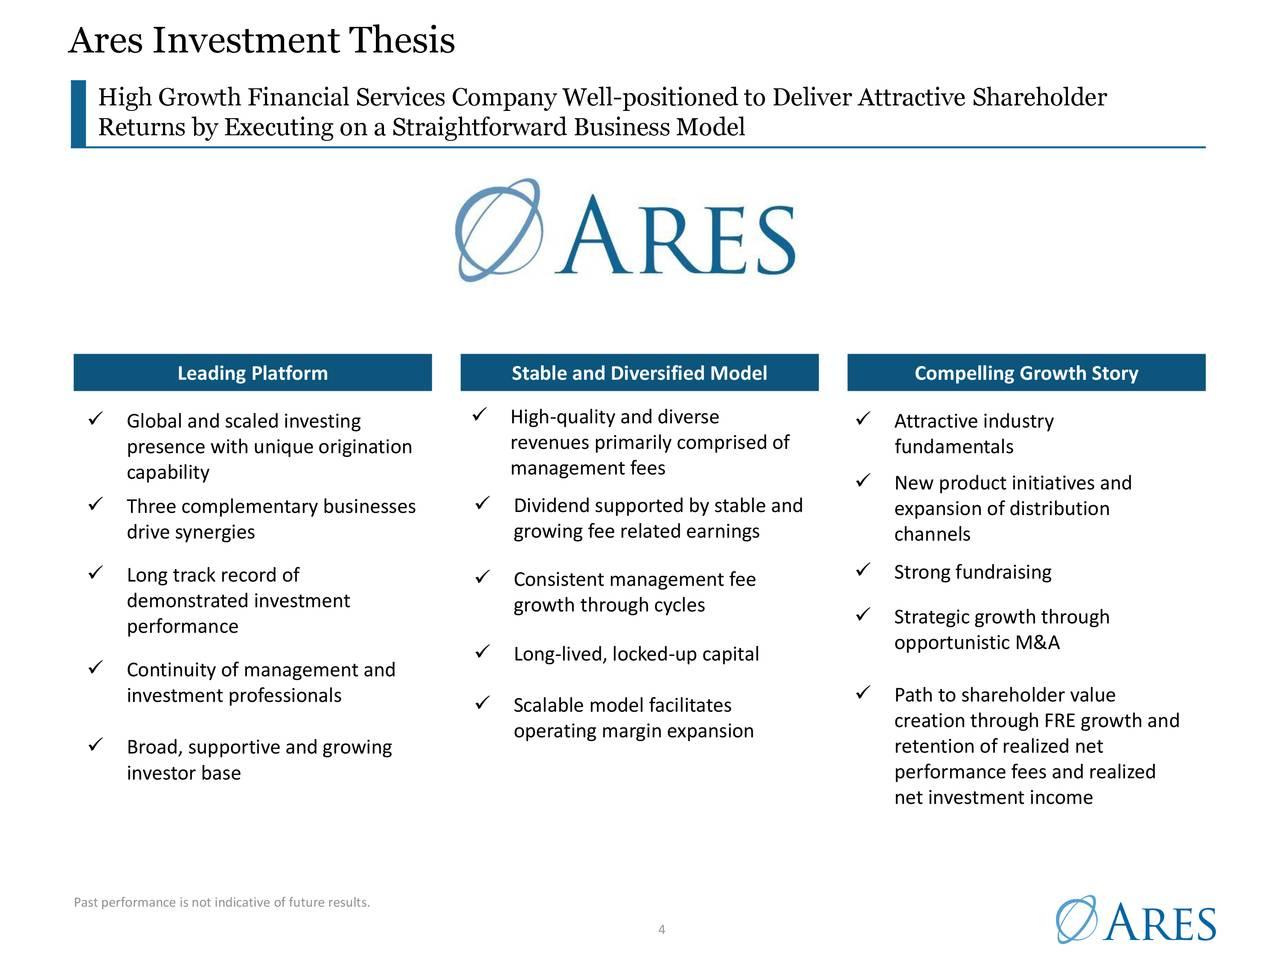 Tesis de Inversión Ares